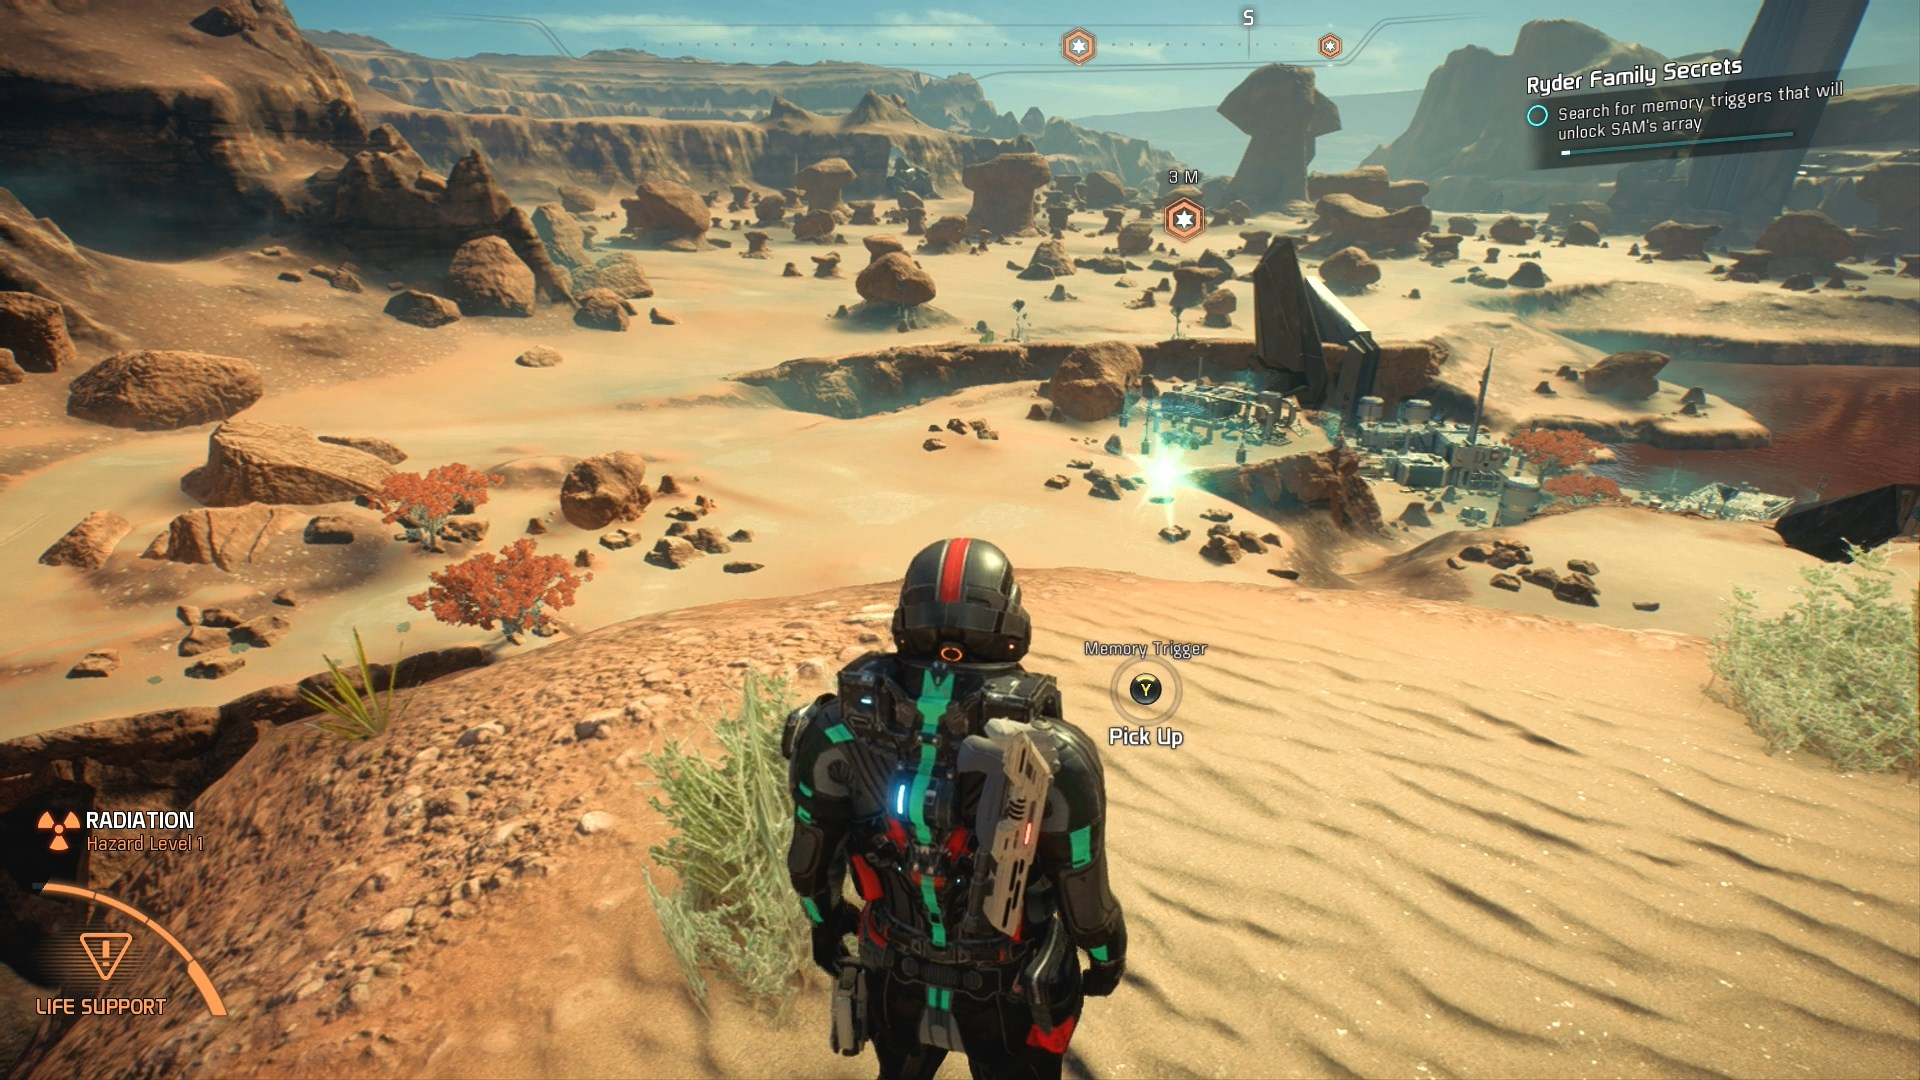 Mass Effect Andromeda Eos Memory Trigger 1